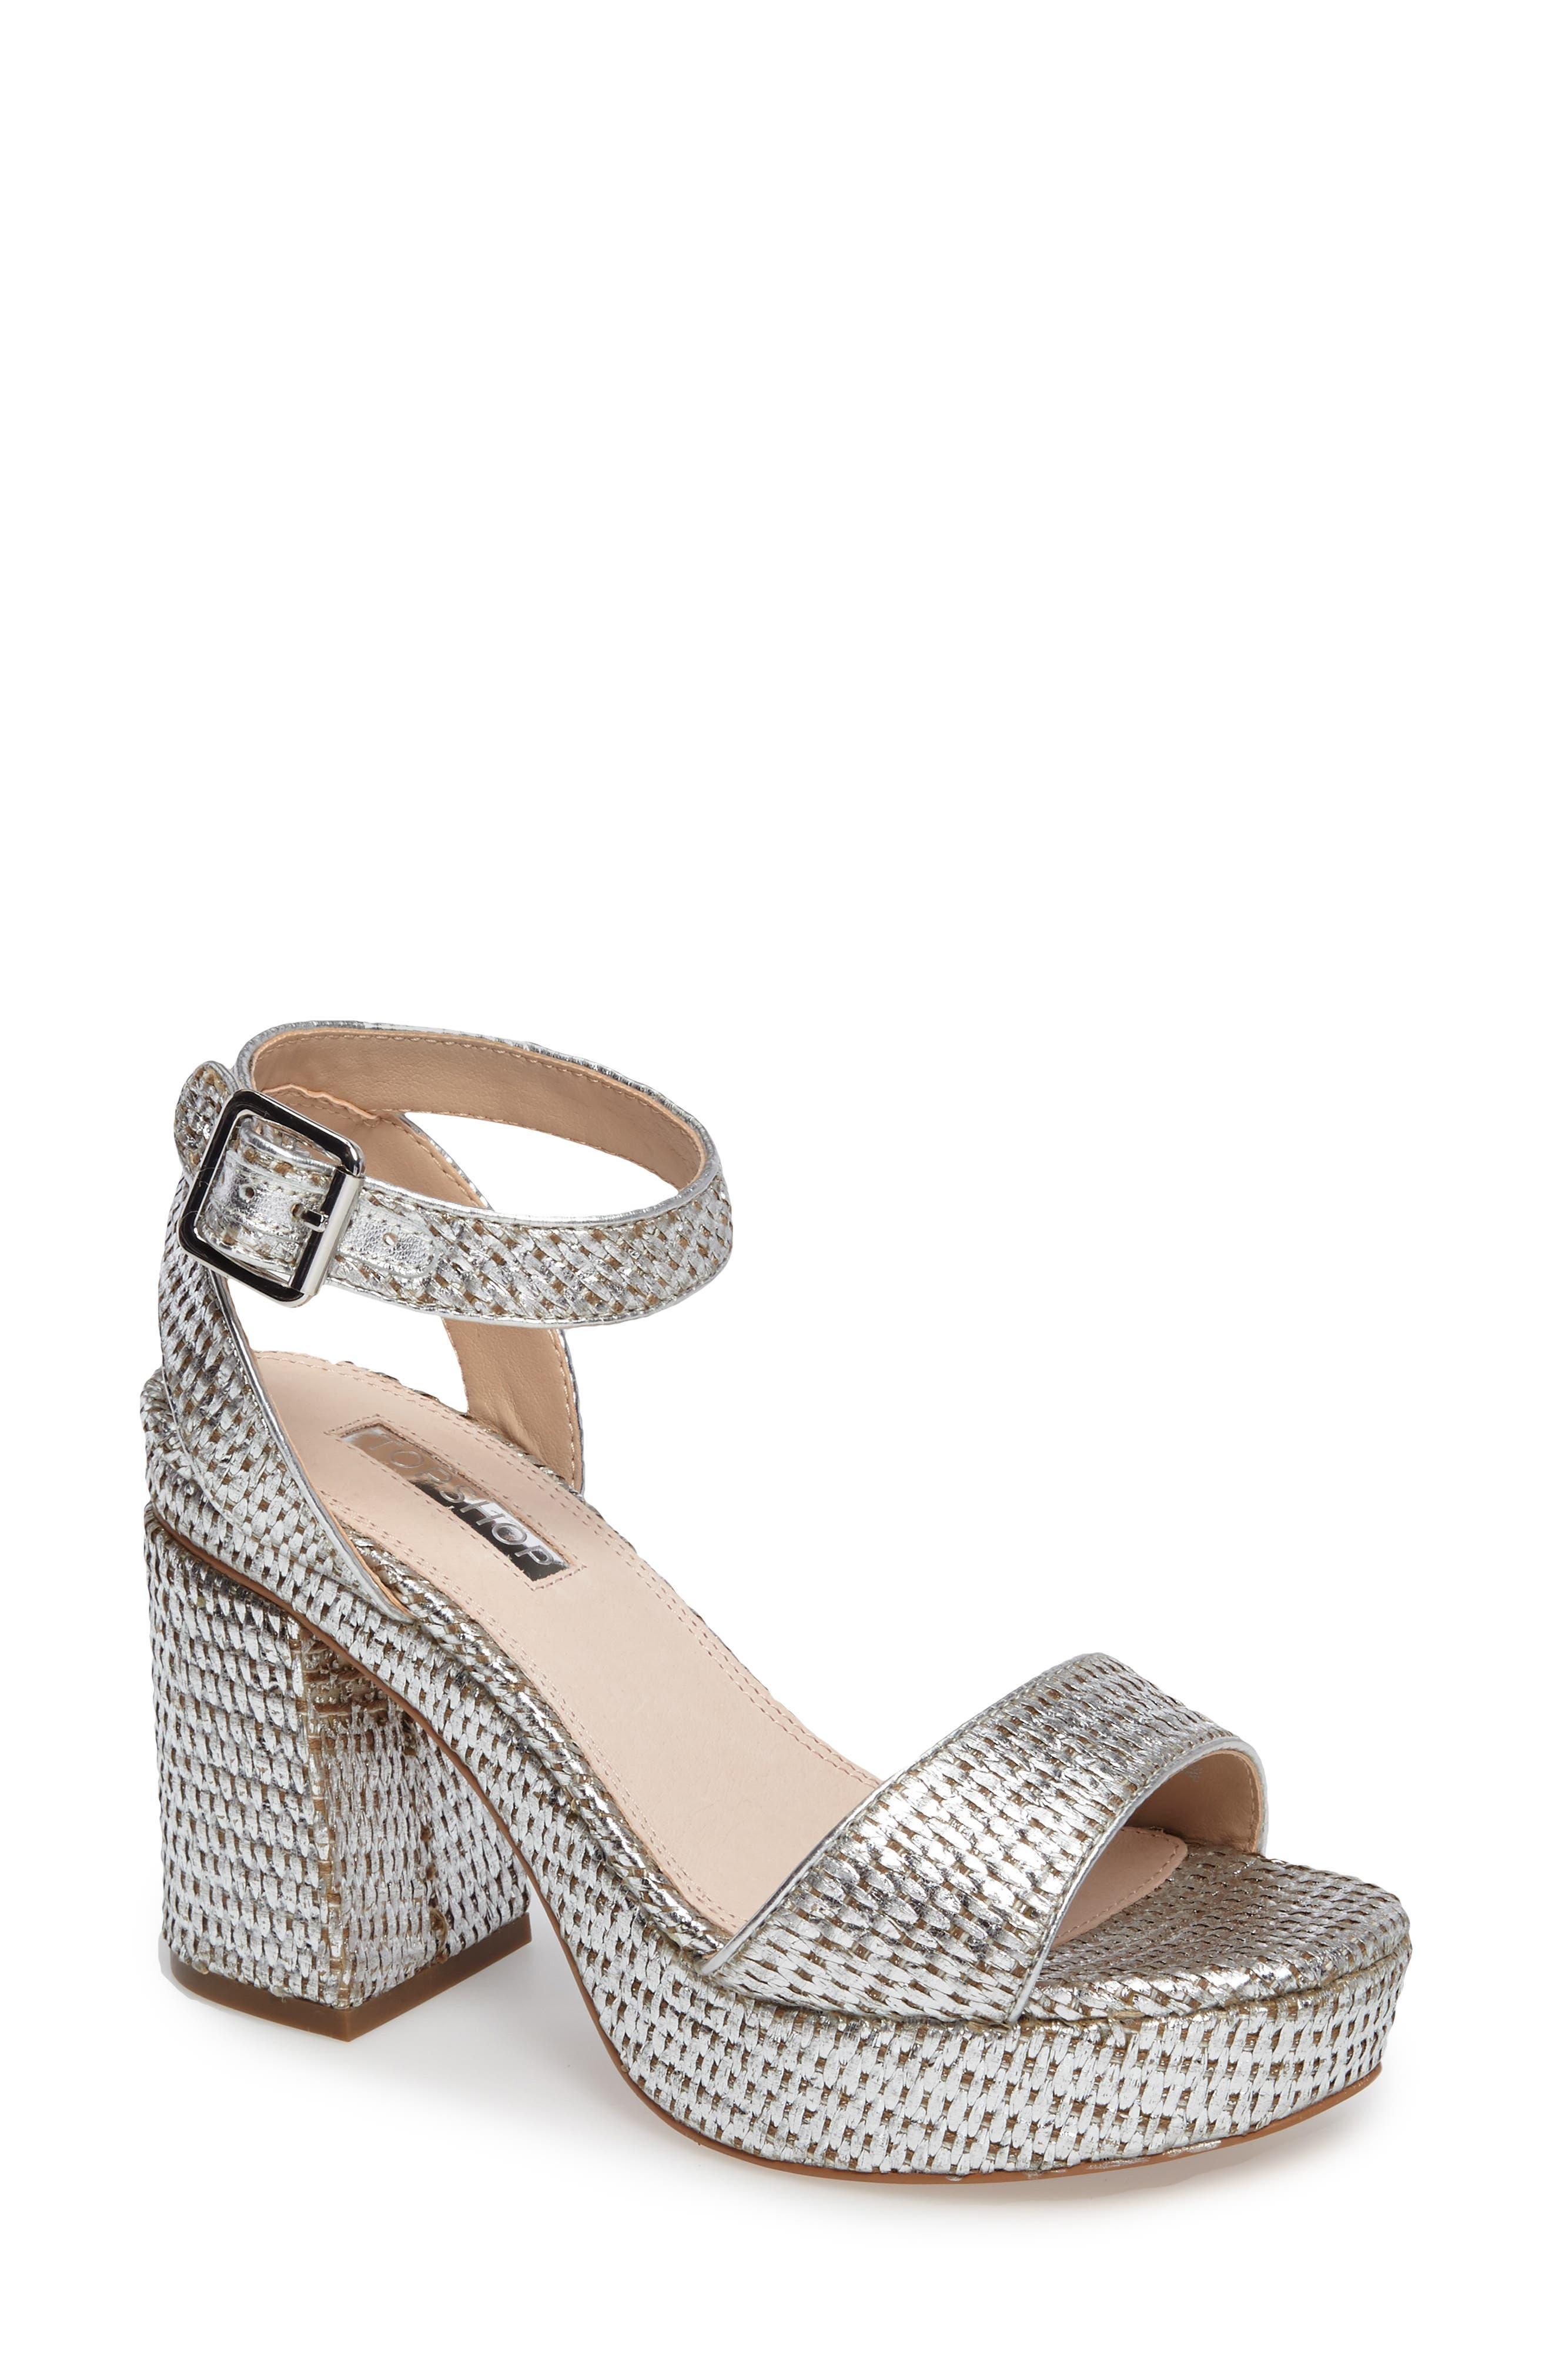 Main Image - Topshop Love Woven Platform Sandal (Women)